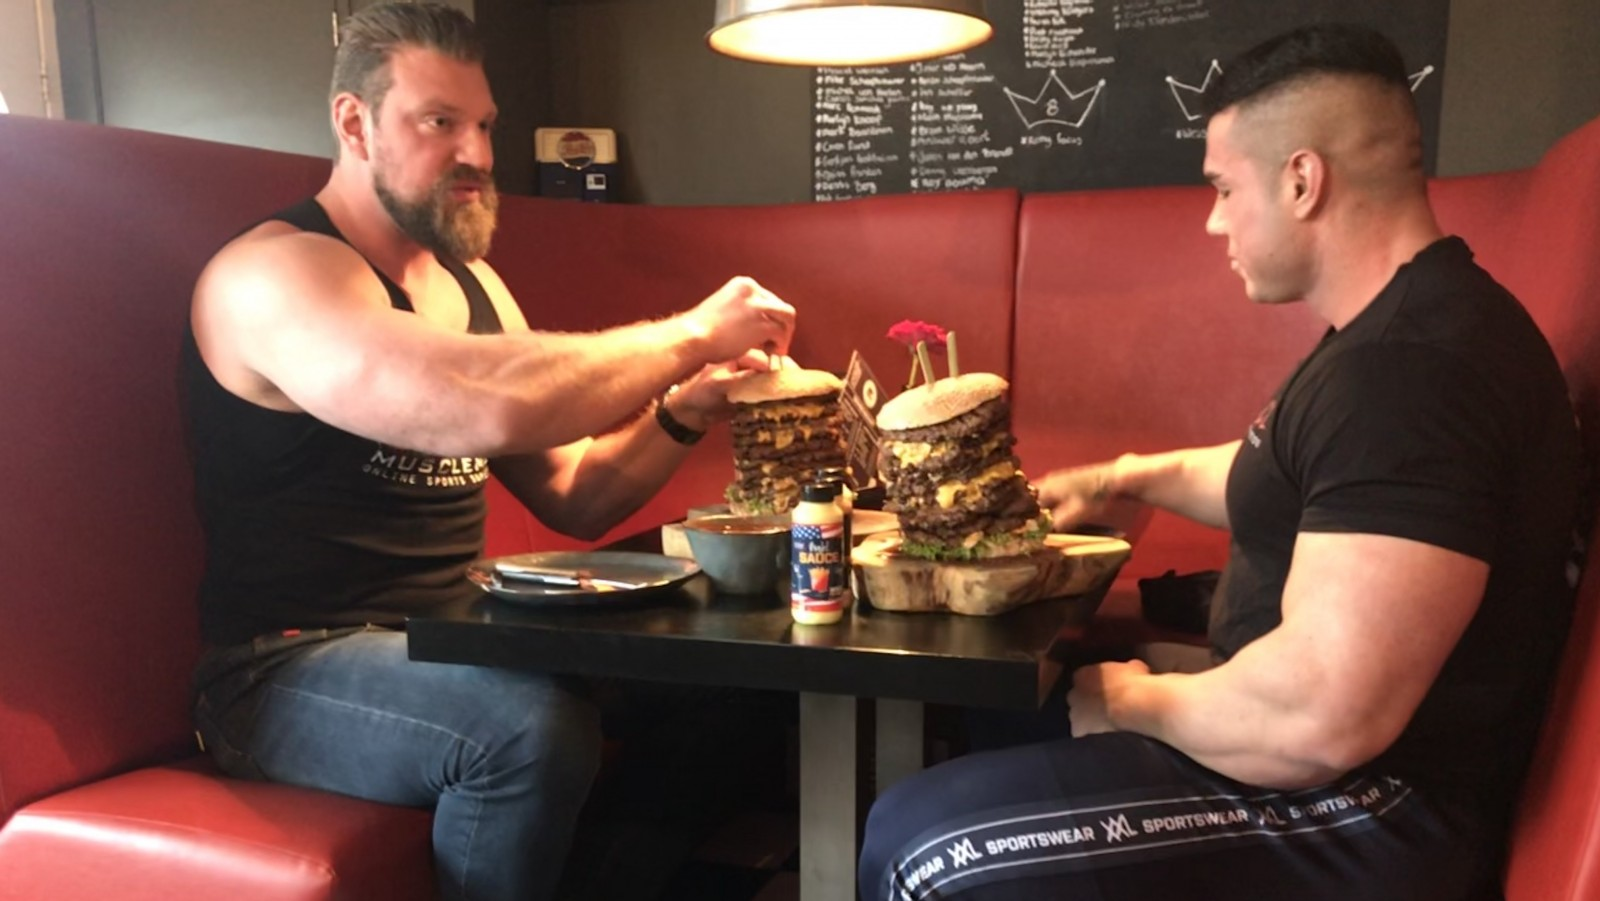 Recordpoging: hamburger van drie kilo eten